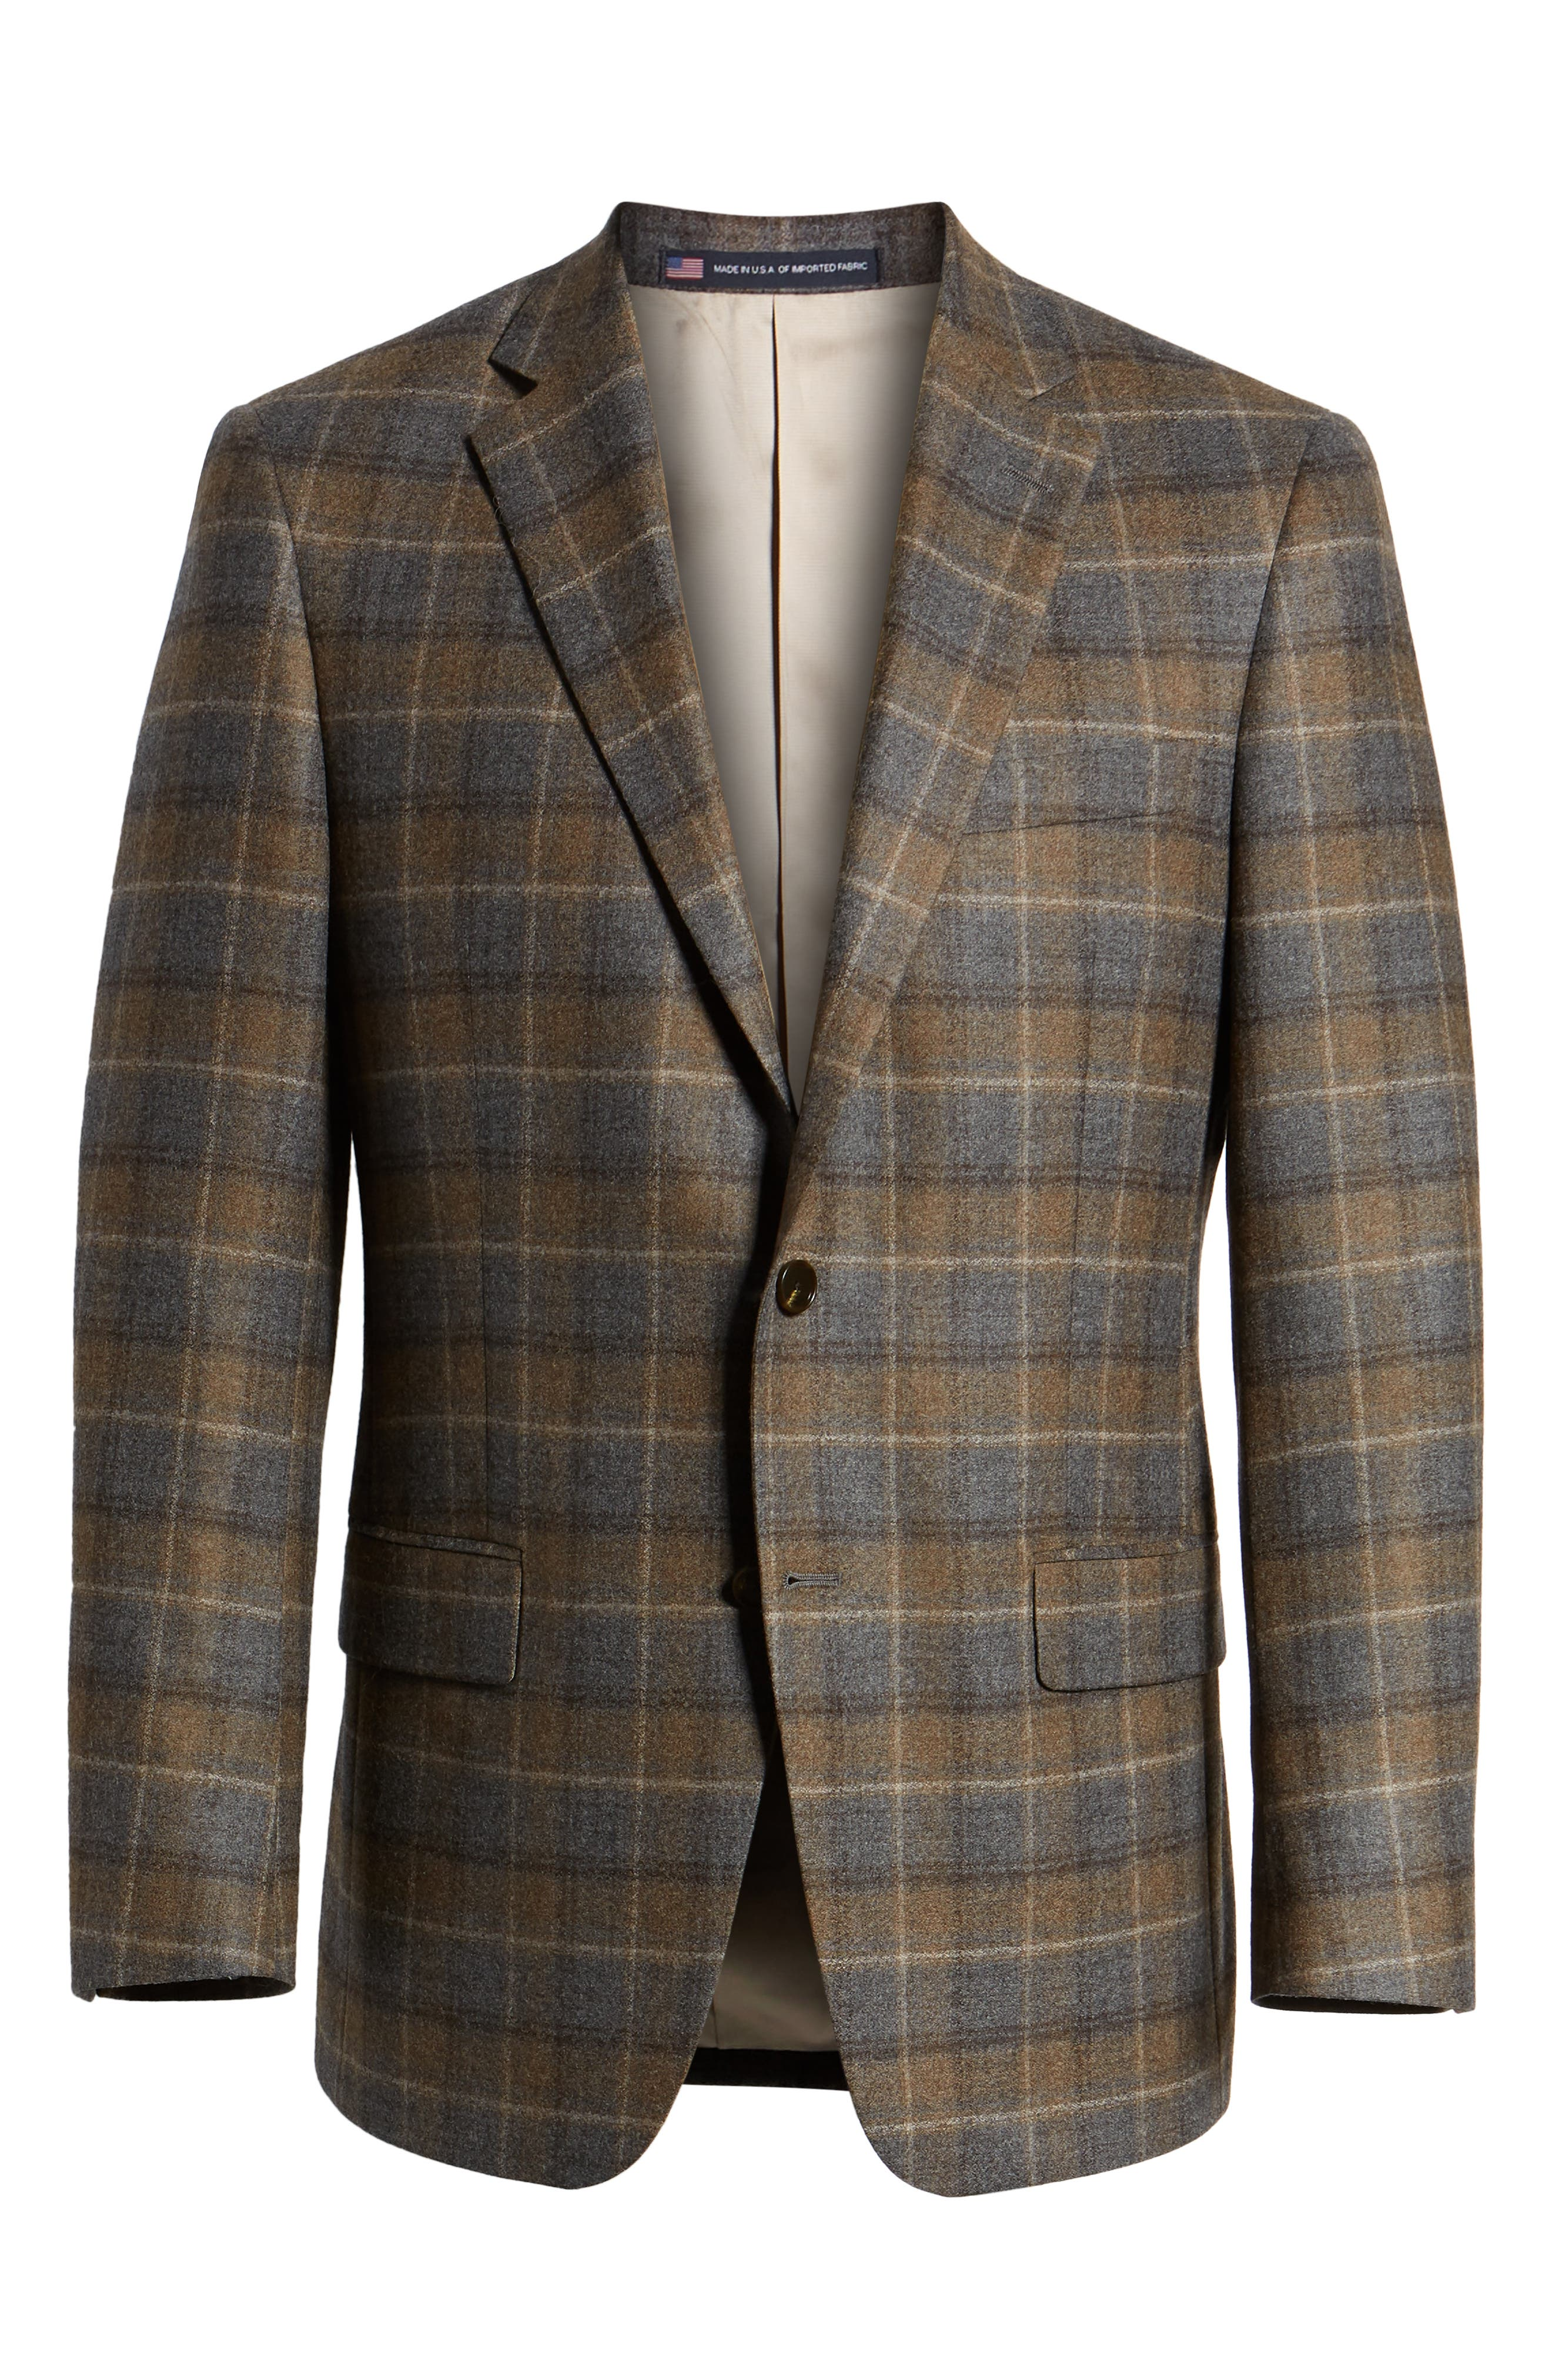 HART SCHAFFNER MARX,                             Classic Fit Plaid Wool Sport Coat,                             Alternate thumbnail 5, color,                             BROWN